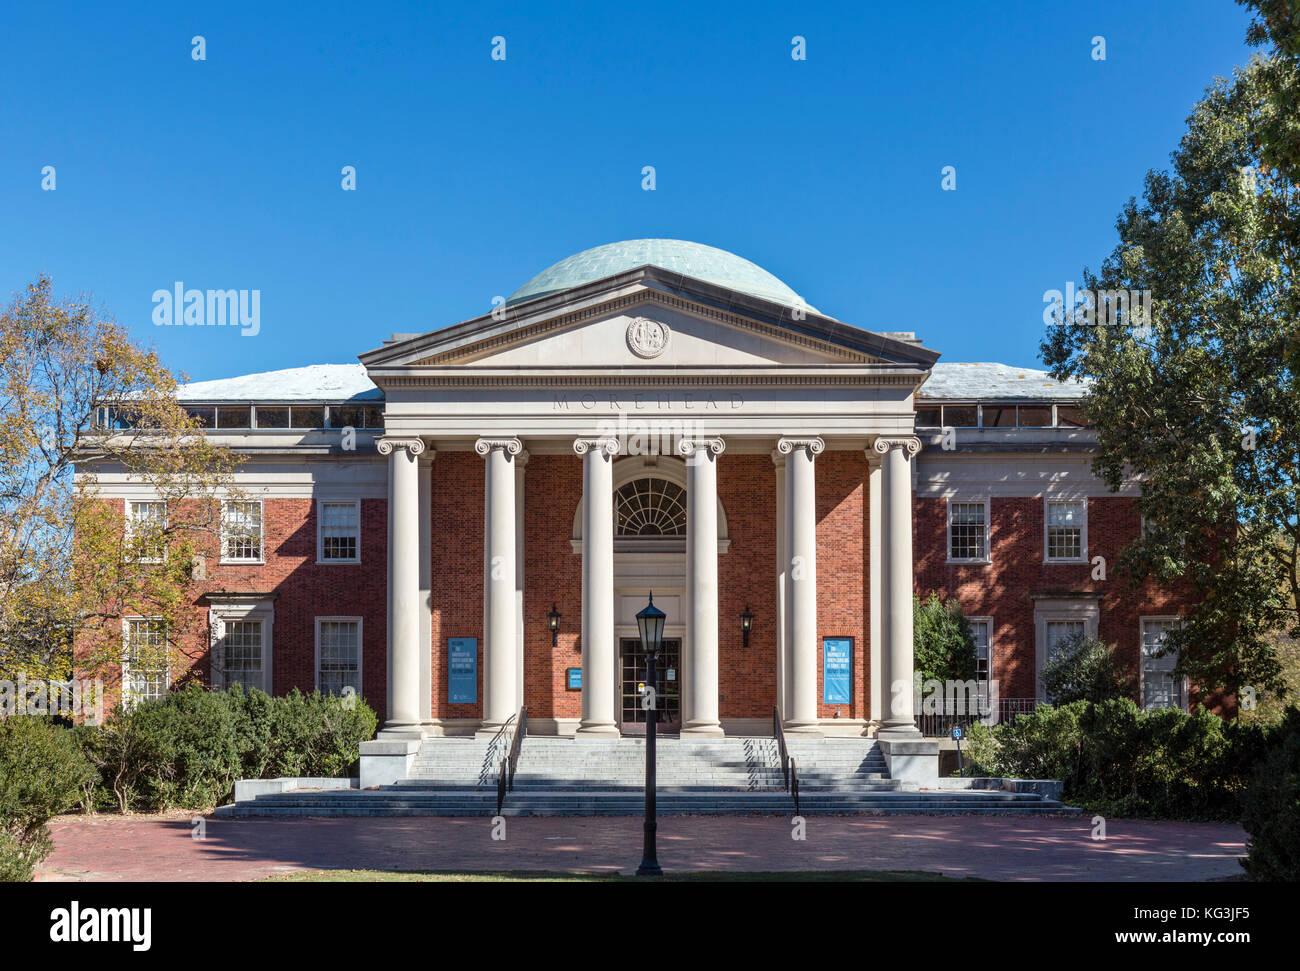 The Morehead Planetarium and Science Center, University of North Carolina at Chapel Hill, North Carolina, USA - Stock Image